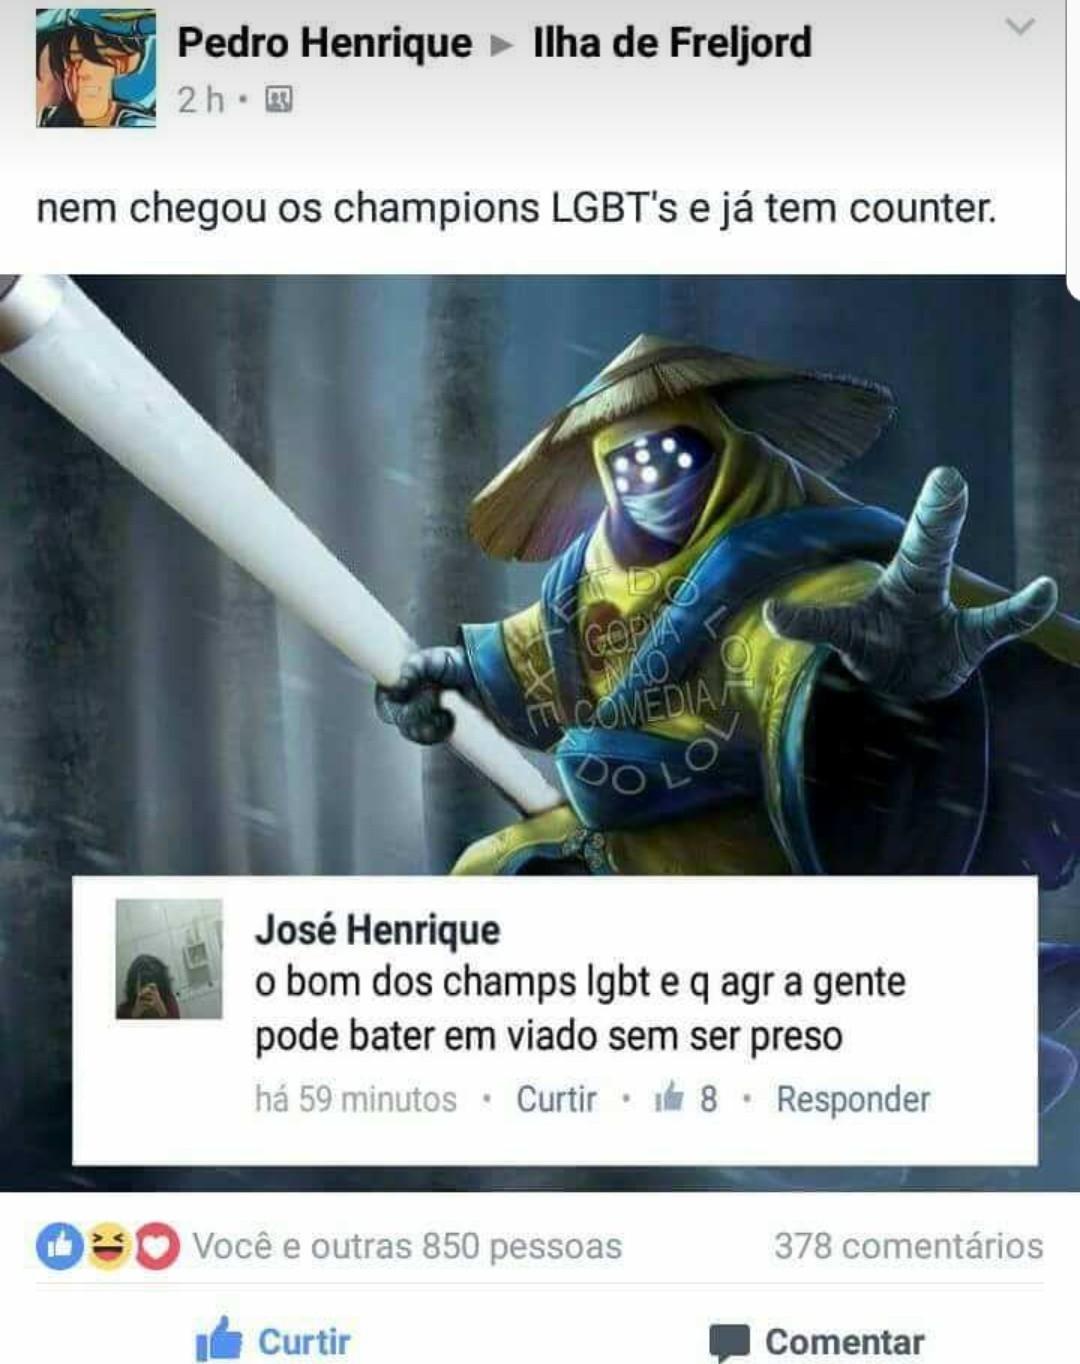 Carai borracha mano (se for repost n passa) - meme